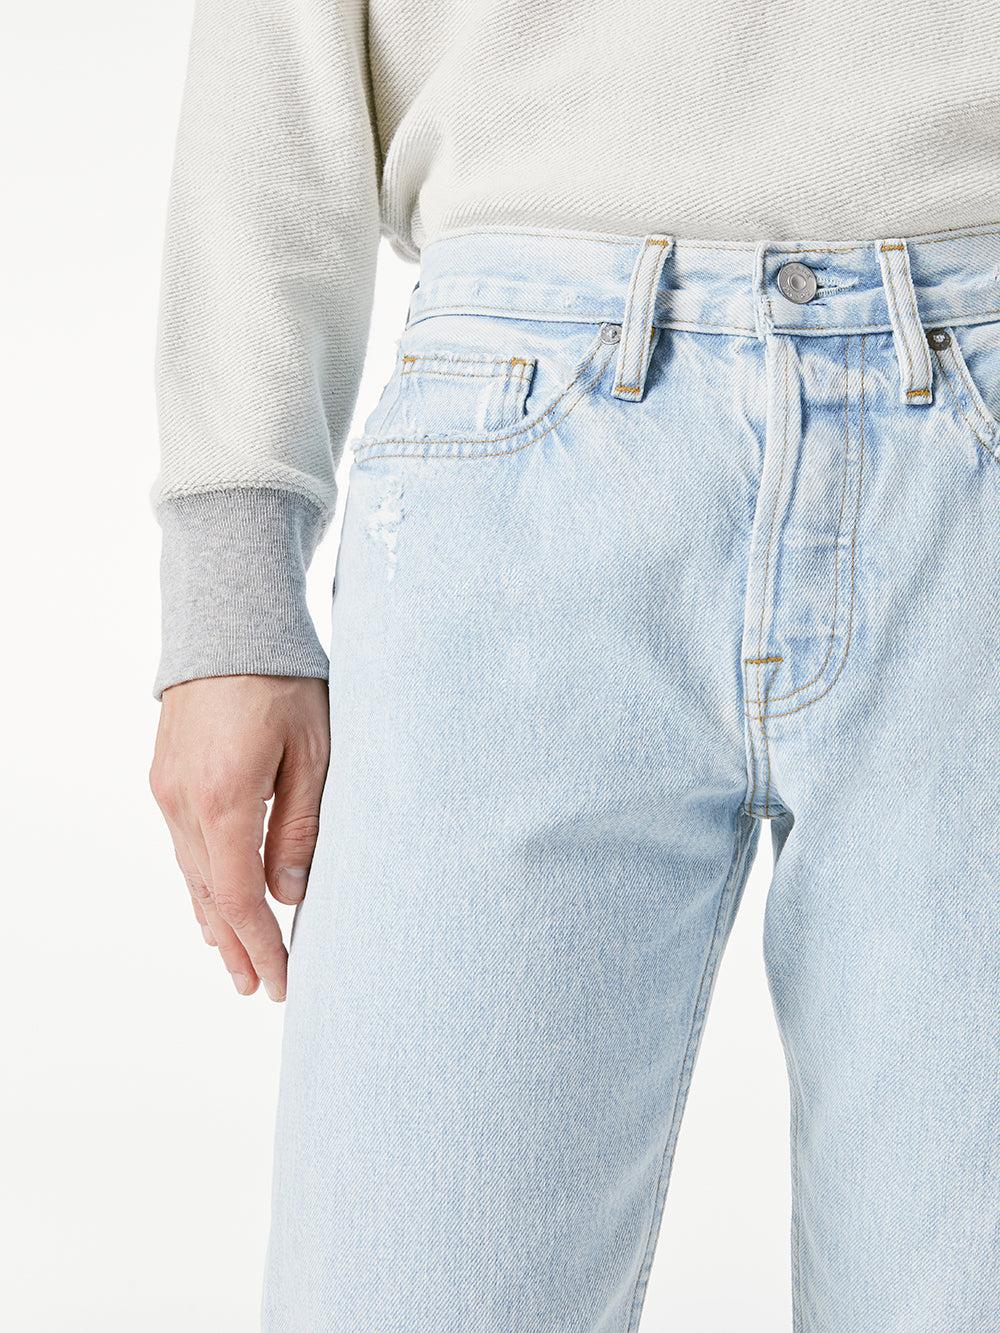 Details about  / NEW Frame Denim Men/'s L/'Homme Skinny Jeans soldout new london los angeles sz 29